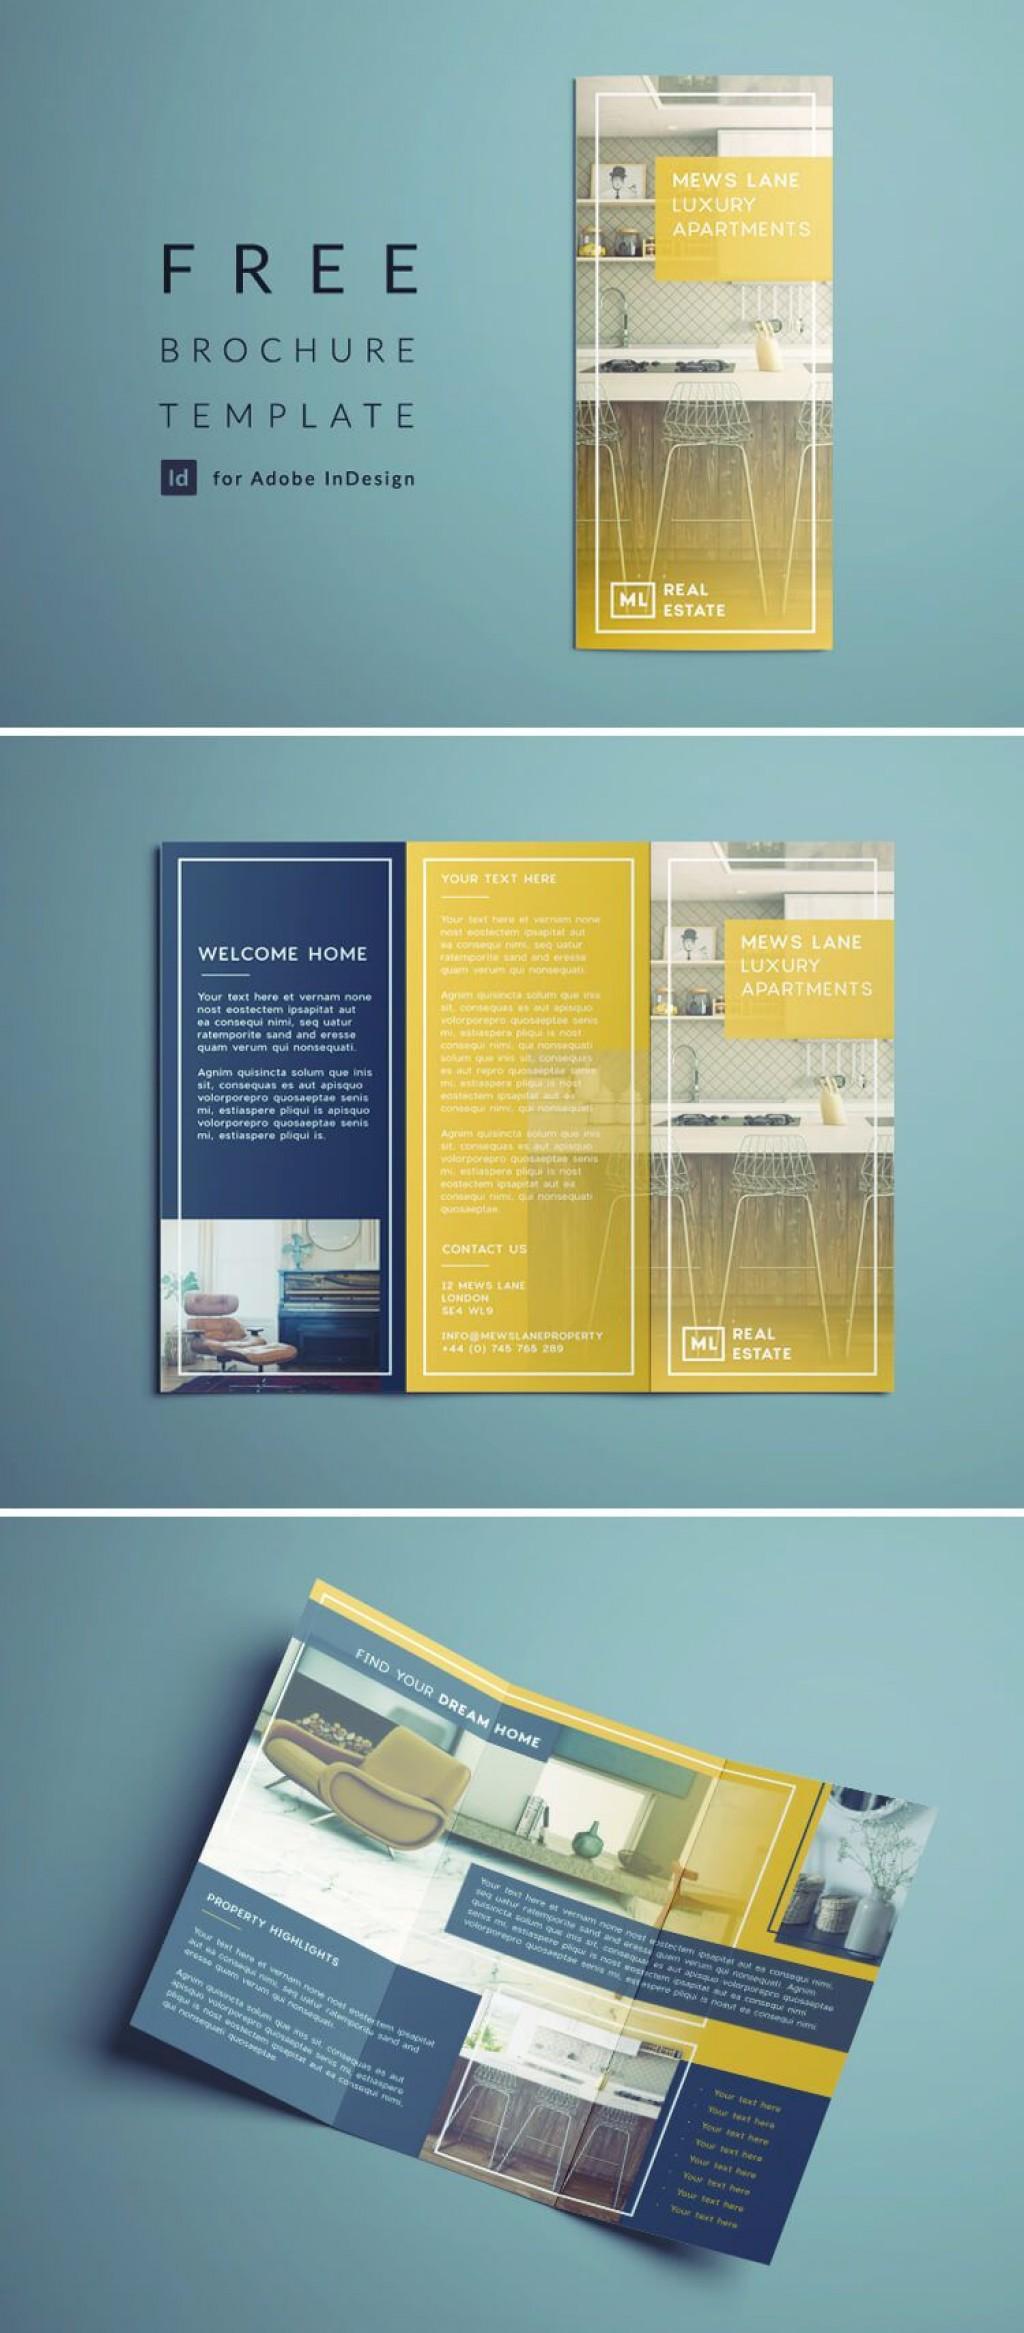 007 Outstanding Indesign Trifold Brochure Template Image  Templates Adobe Tri Fold Bi Free DownloadLarge